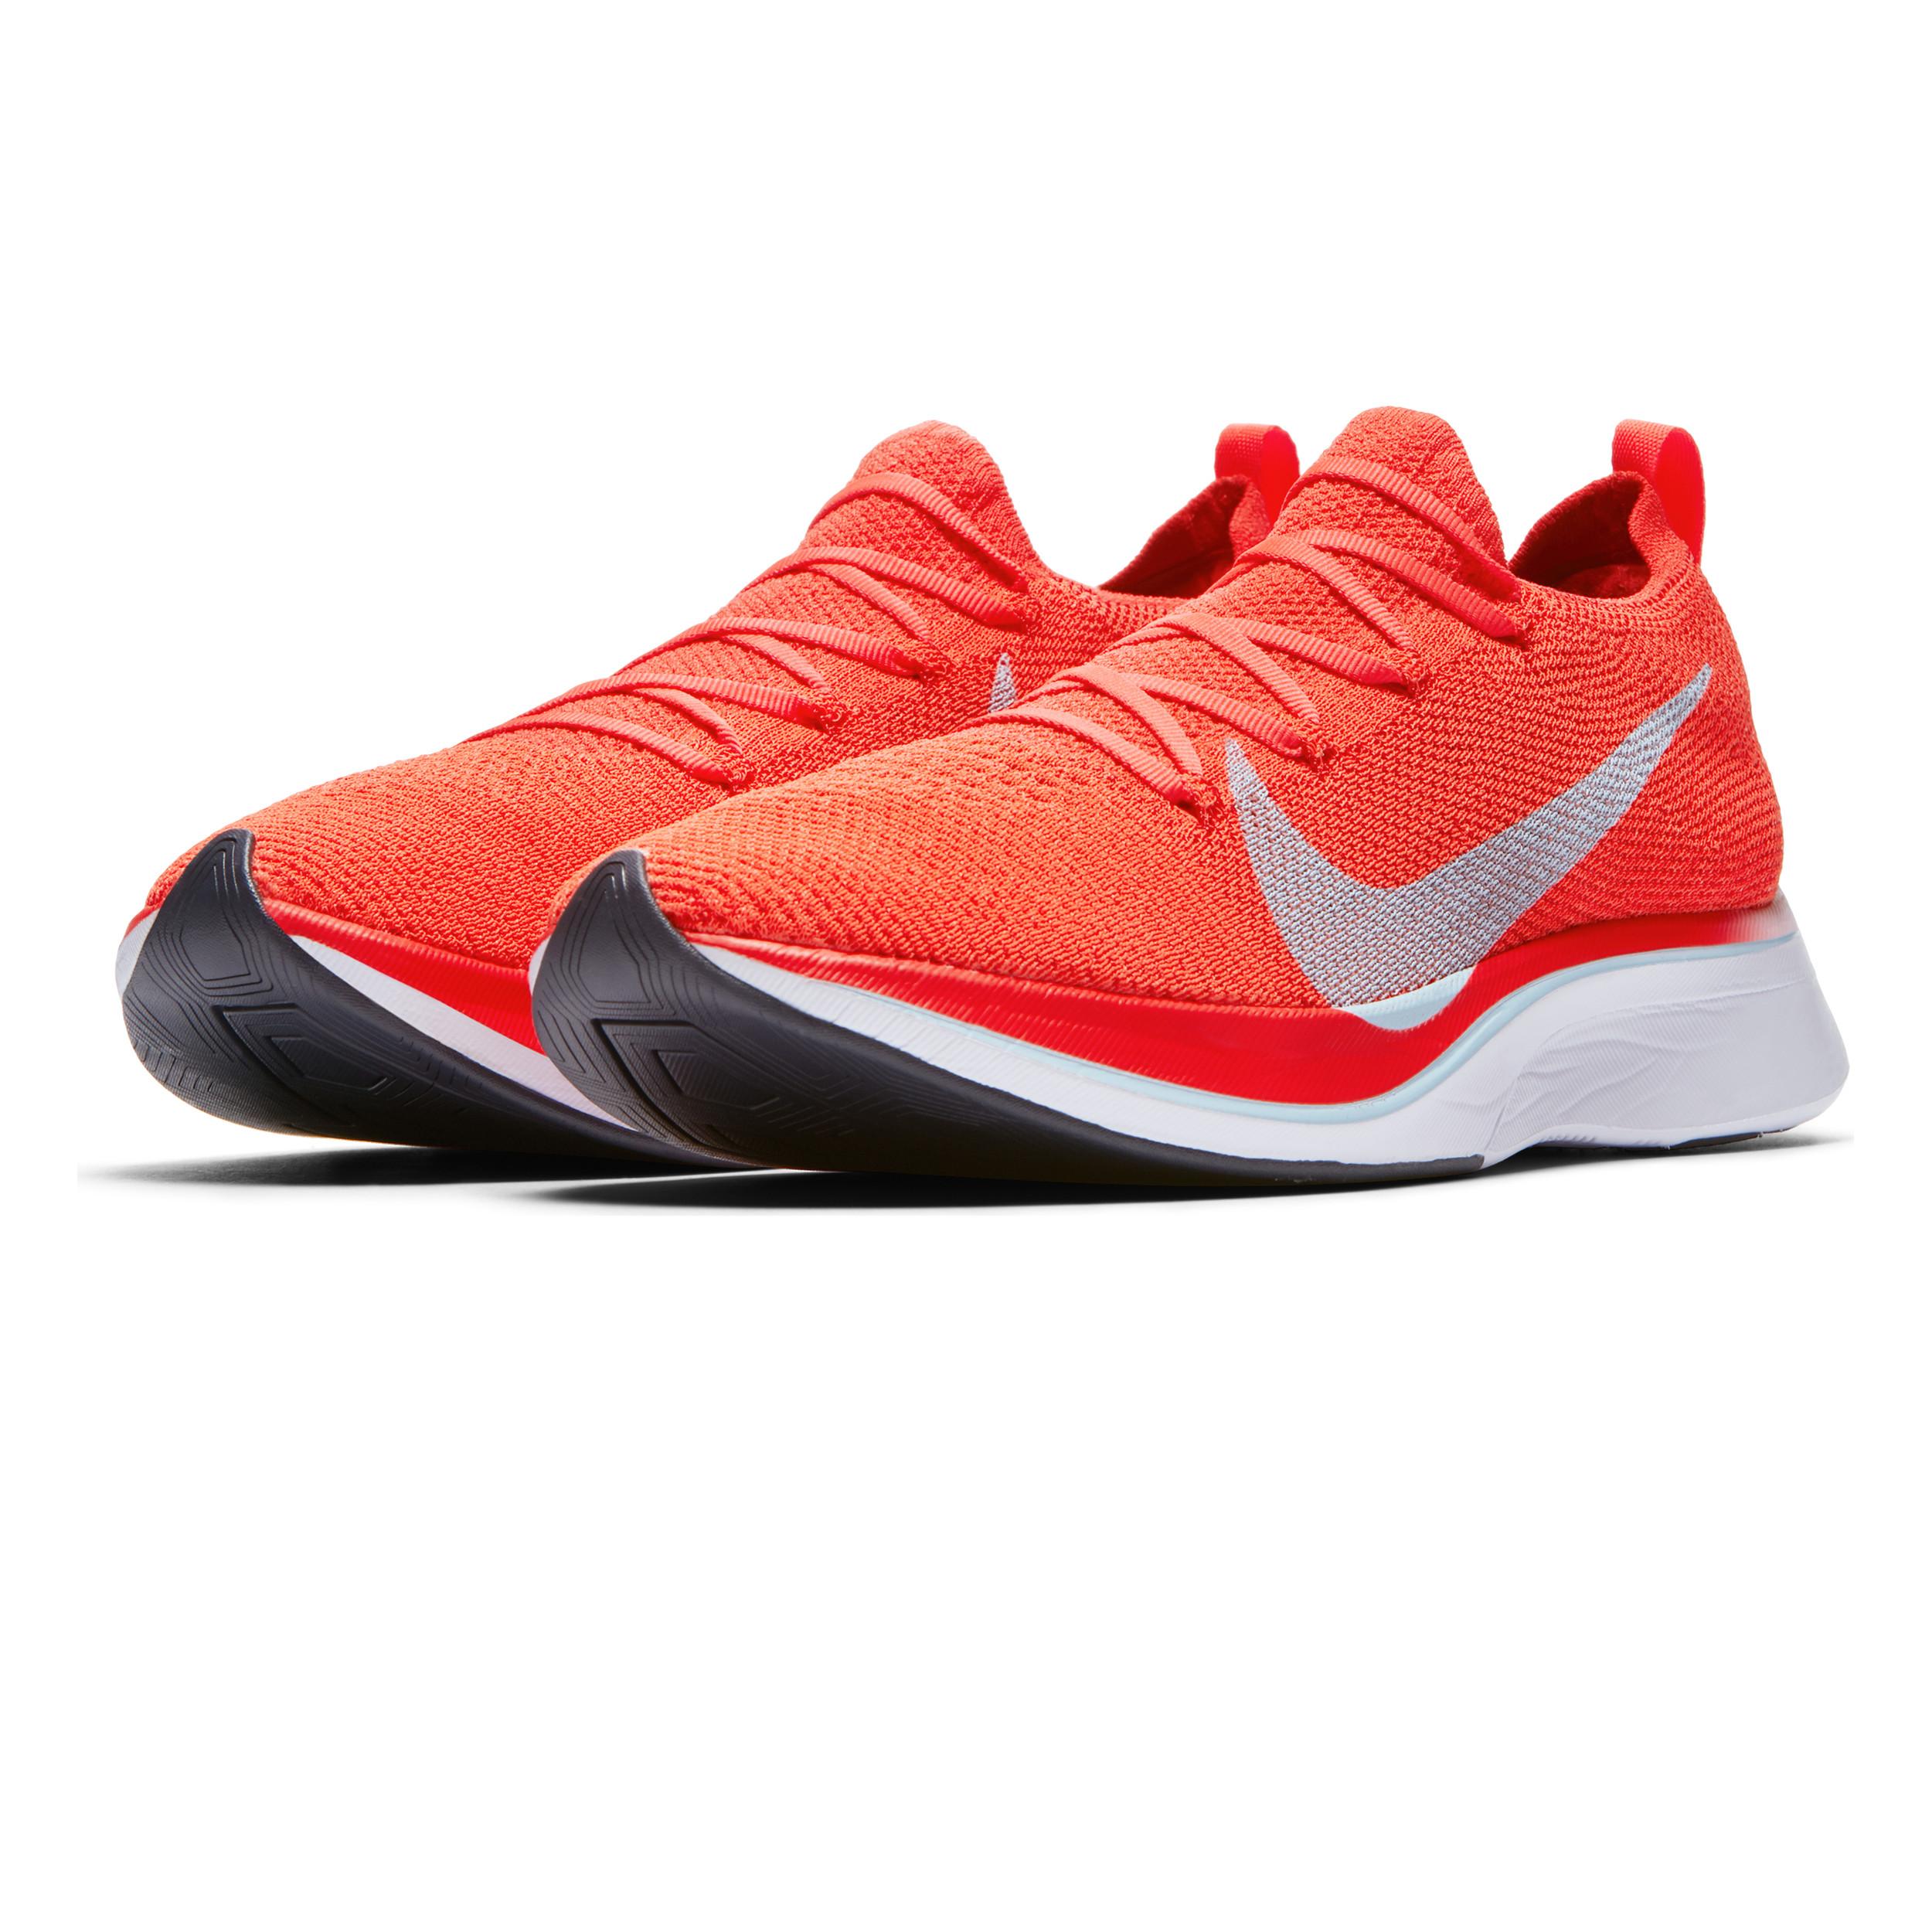 Nike Vaporfly 4% Flyknit Running Shoes - HO18